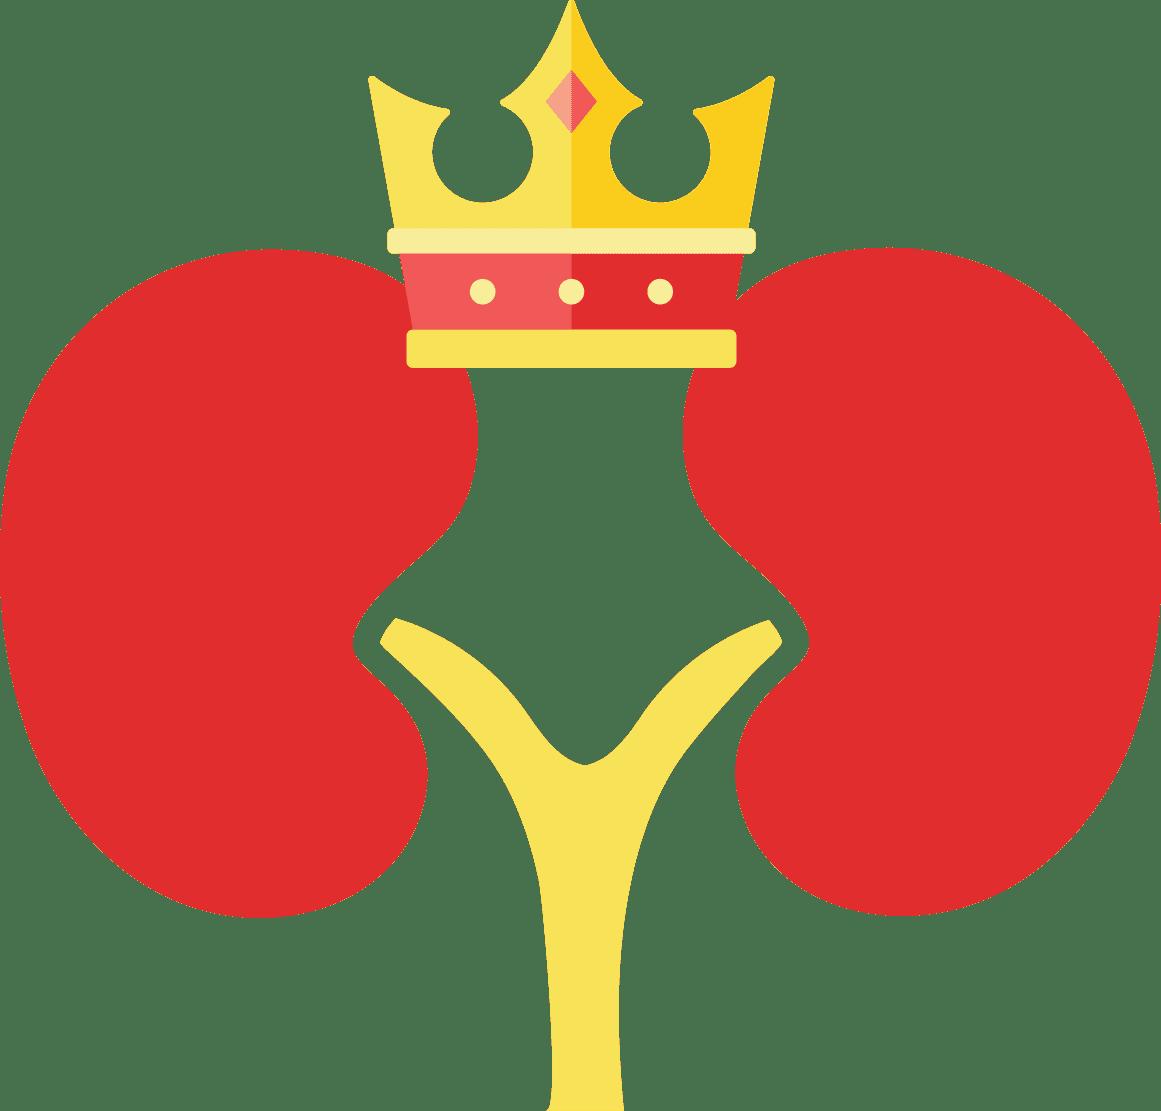 King Kidney